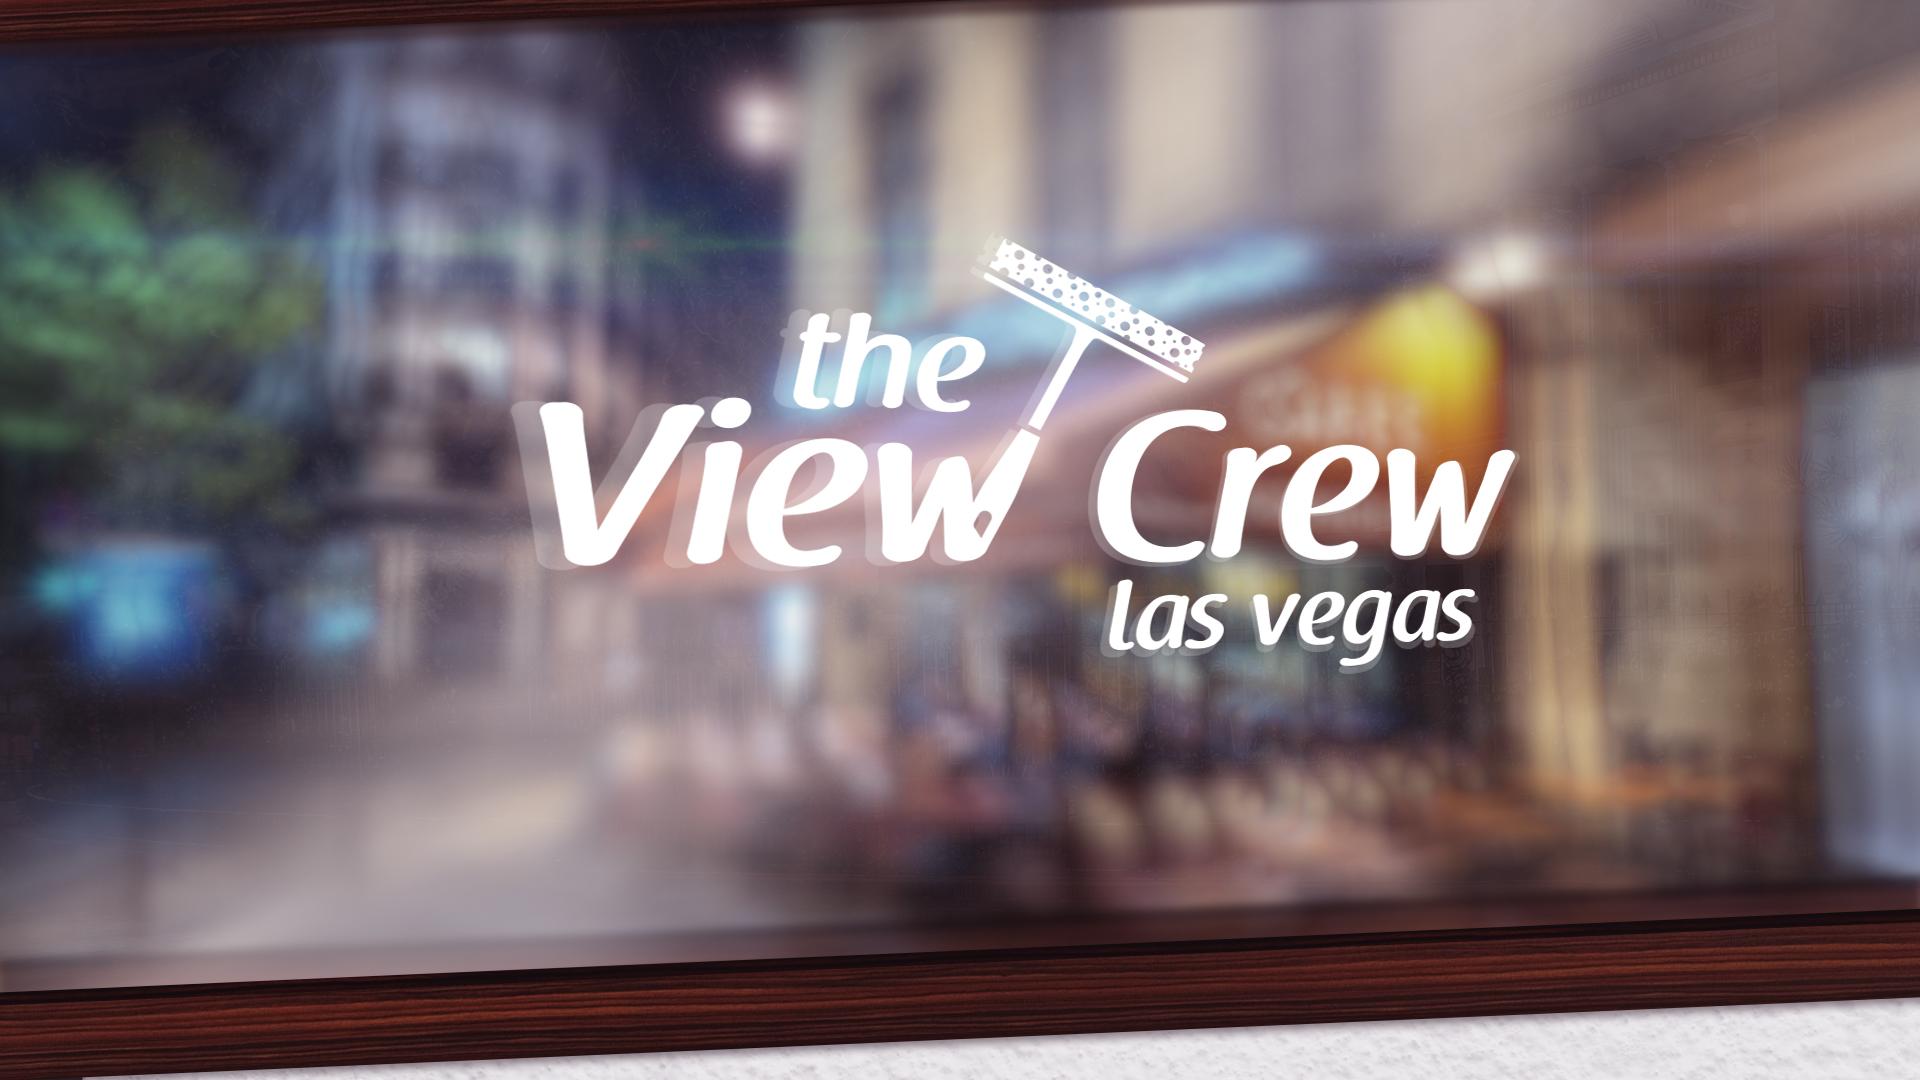 theviewcrewmockup.jpg